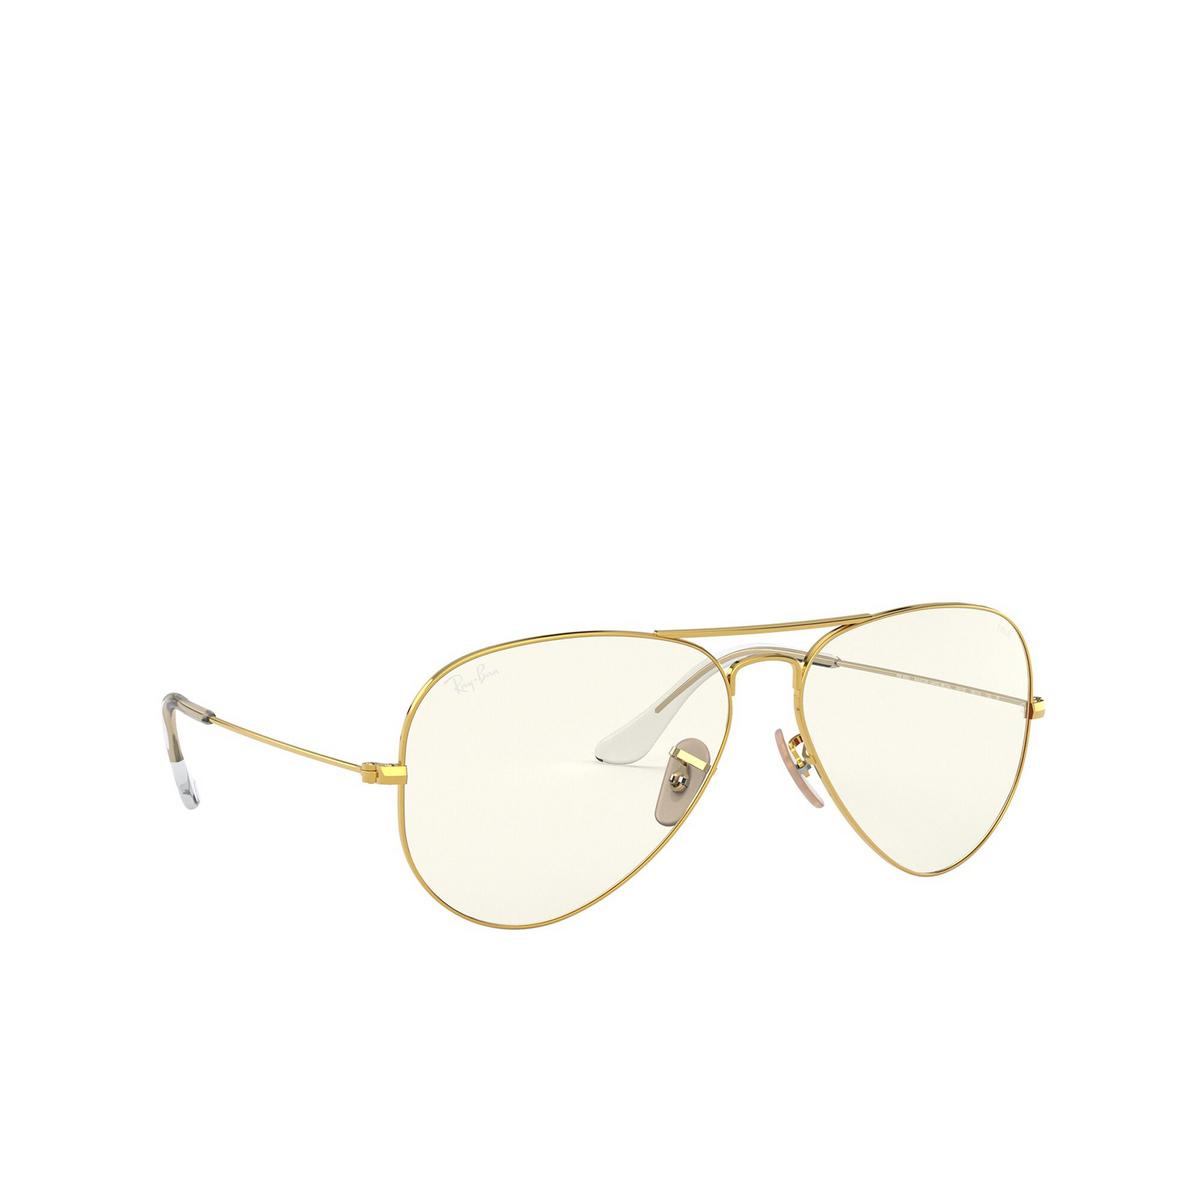 Ray-Ban® Aviator Sunglasses: Aviator Large Metal RB3025 color Arista 001/5F - three-quarters view.